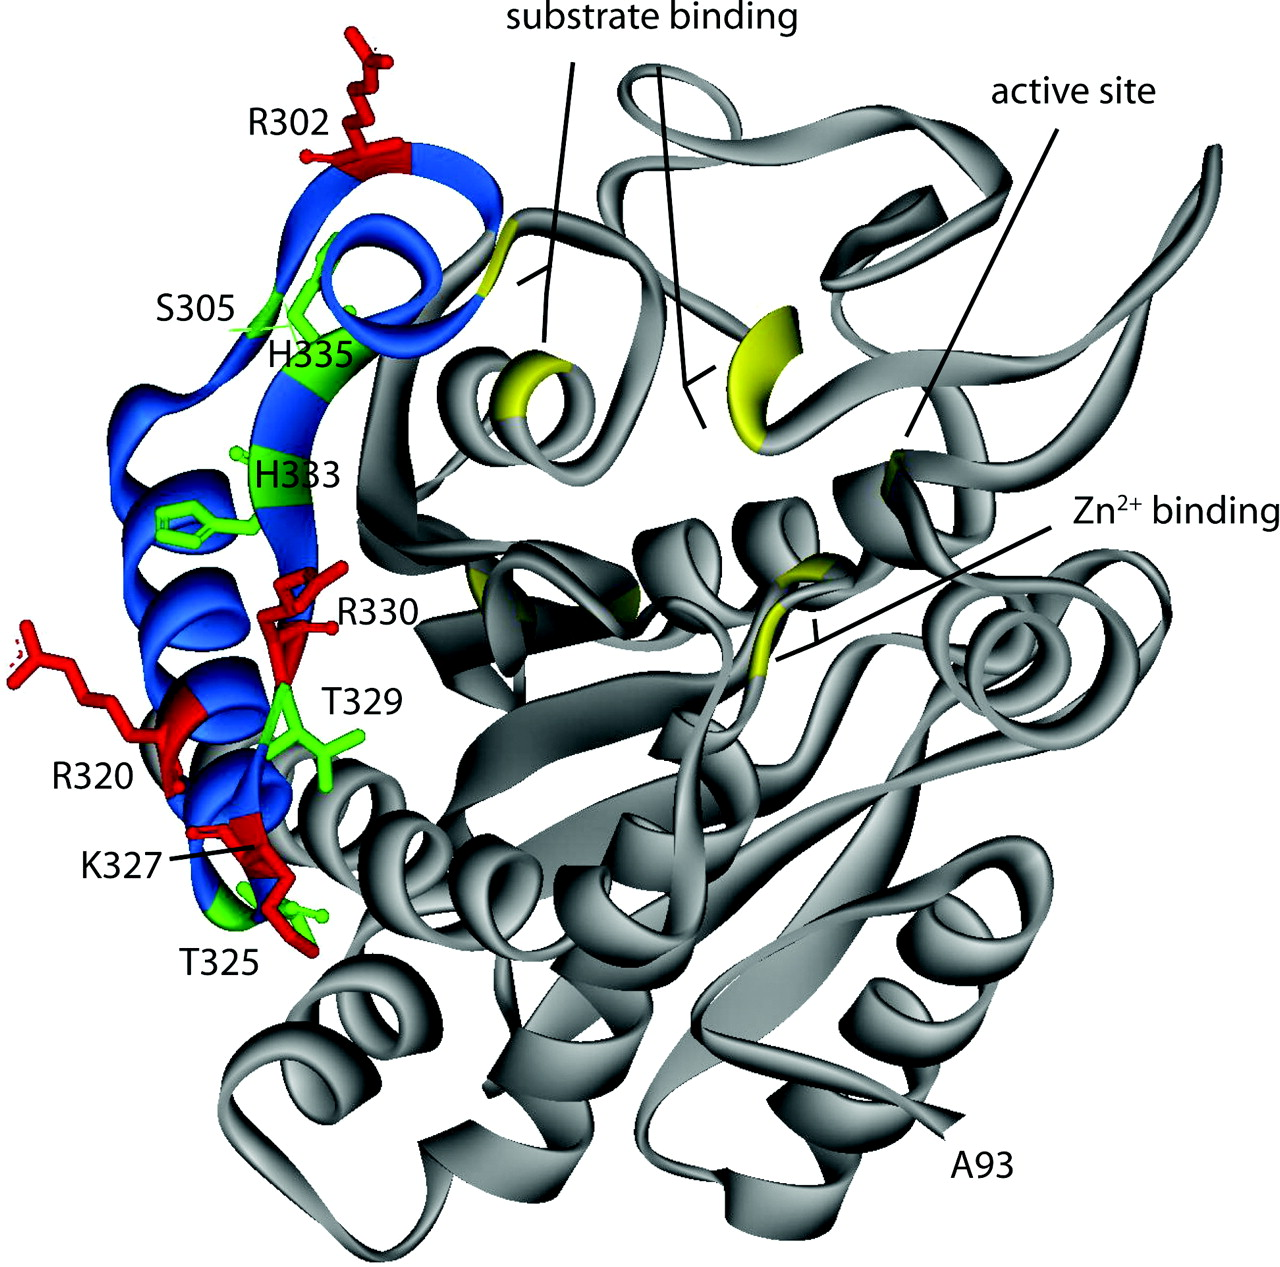 1280x1267 Regulation Of Fibrinolysis By Thrombin Activatable Fibrinolysis